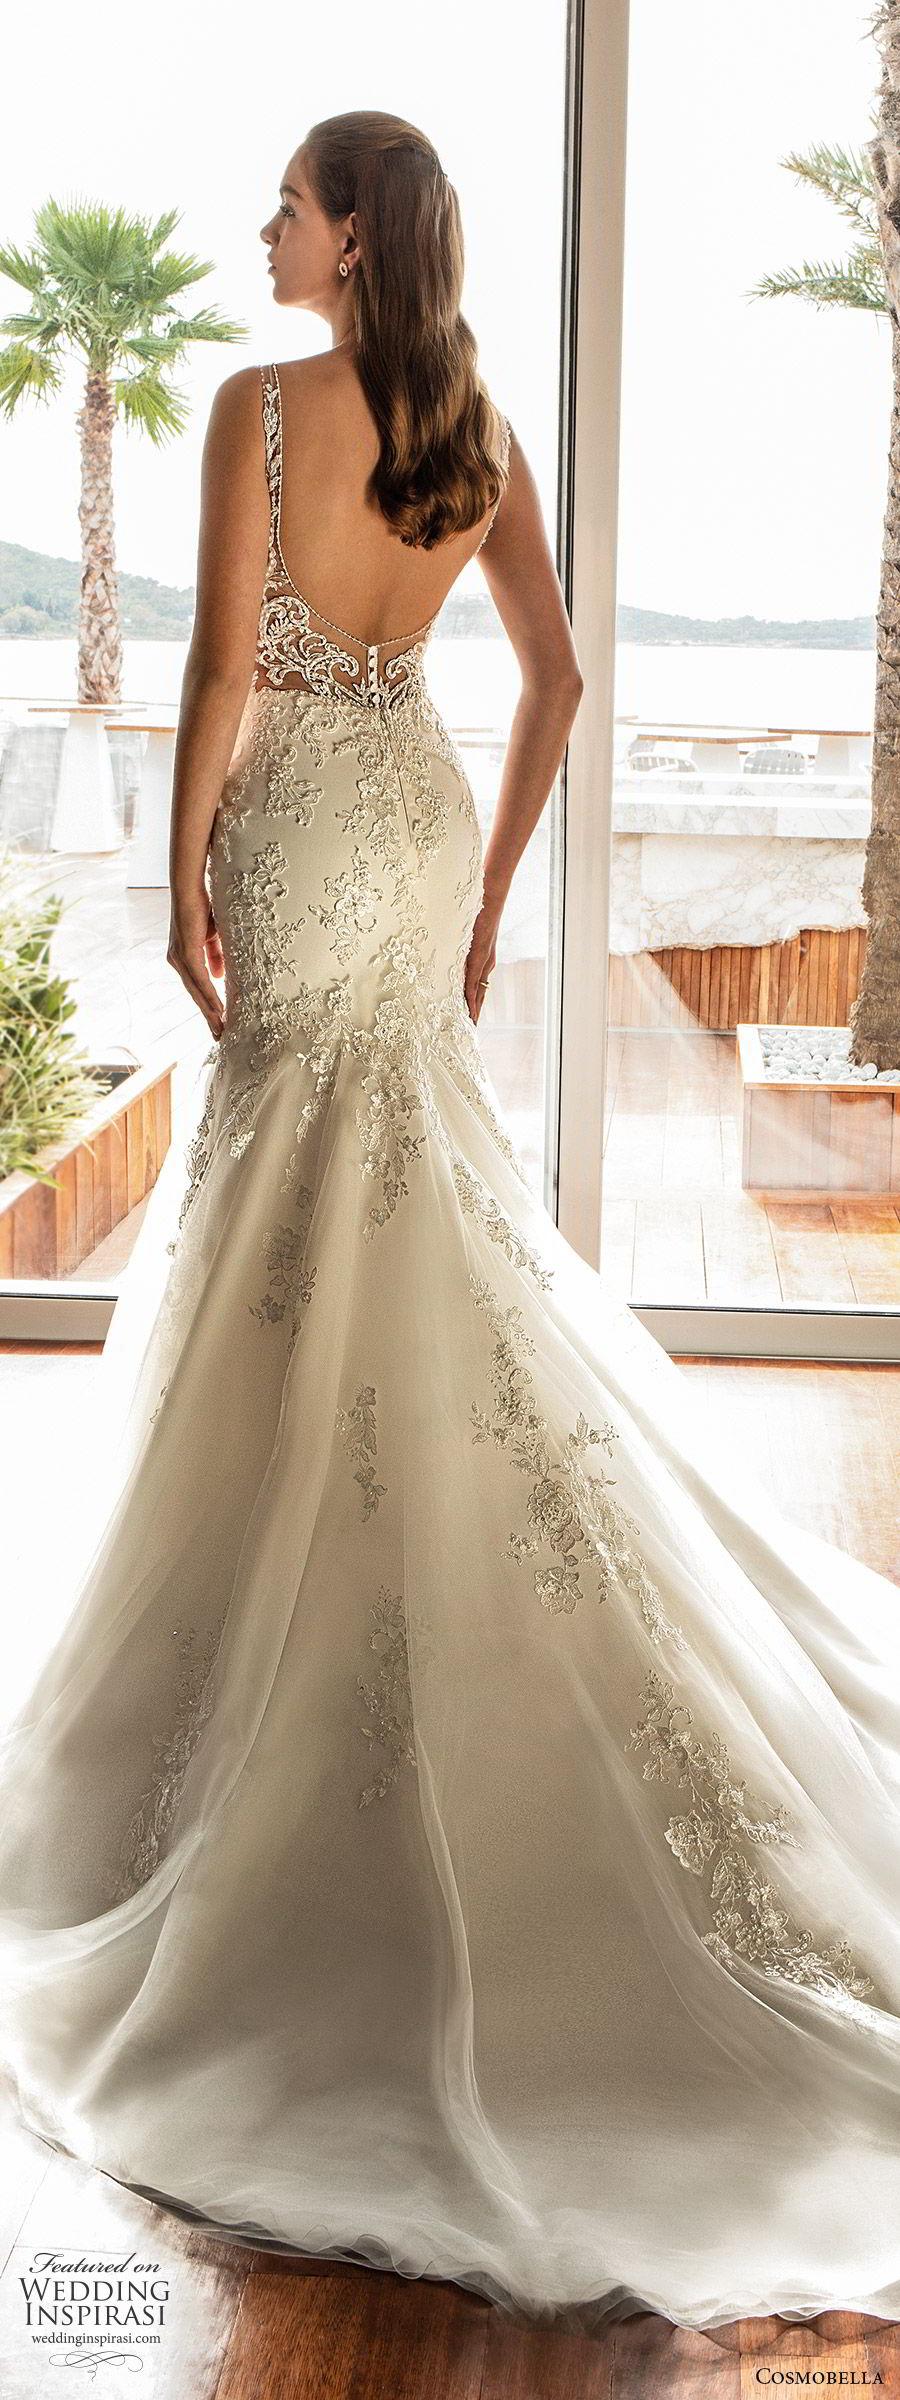 cosmobella 2020 bridal sleeveless illusion straps v neckline fully embellished fit flare mermaid wedding dress (18) glitzy glam low illusion back chapel train bv